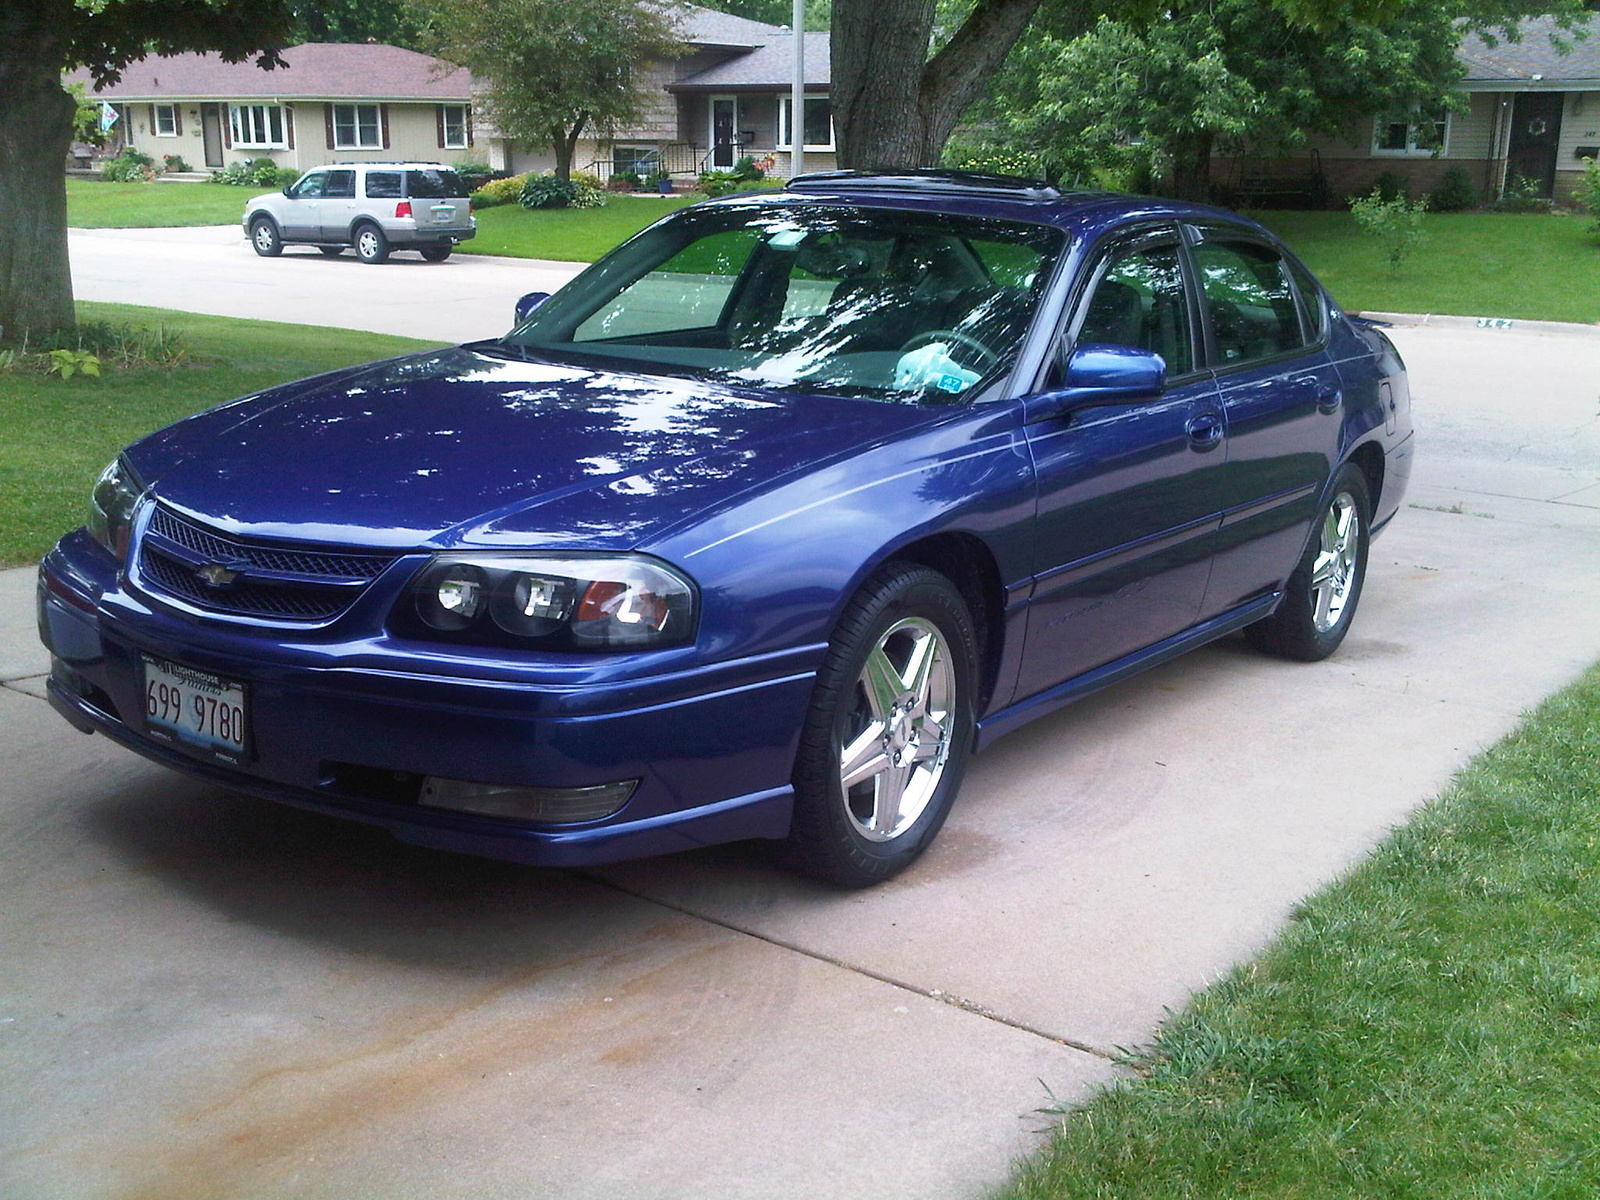 2008 Chevy Malibu Ltz For Sale 2005 Chevrolet Impala - Pictures - CarGurus